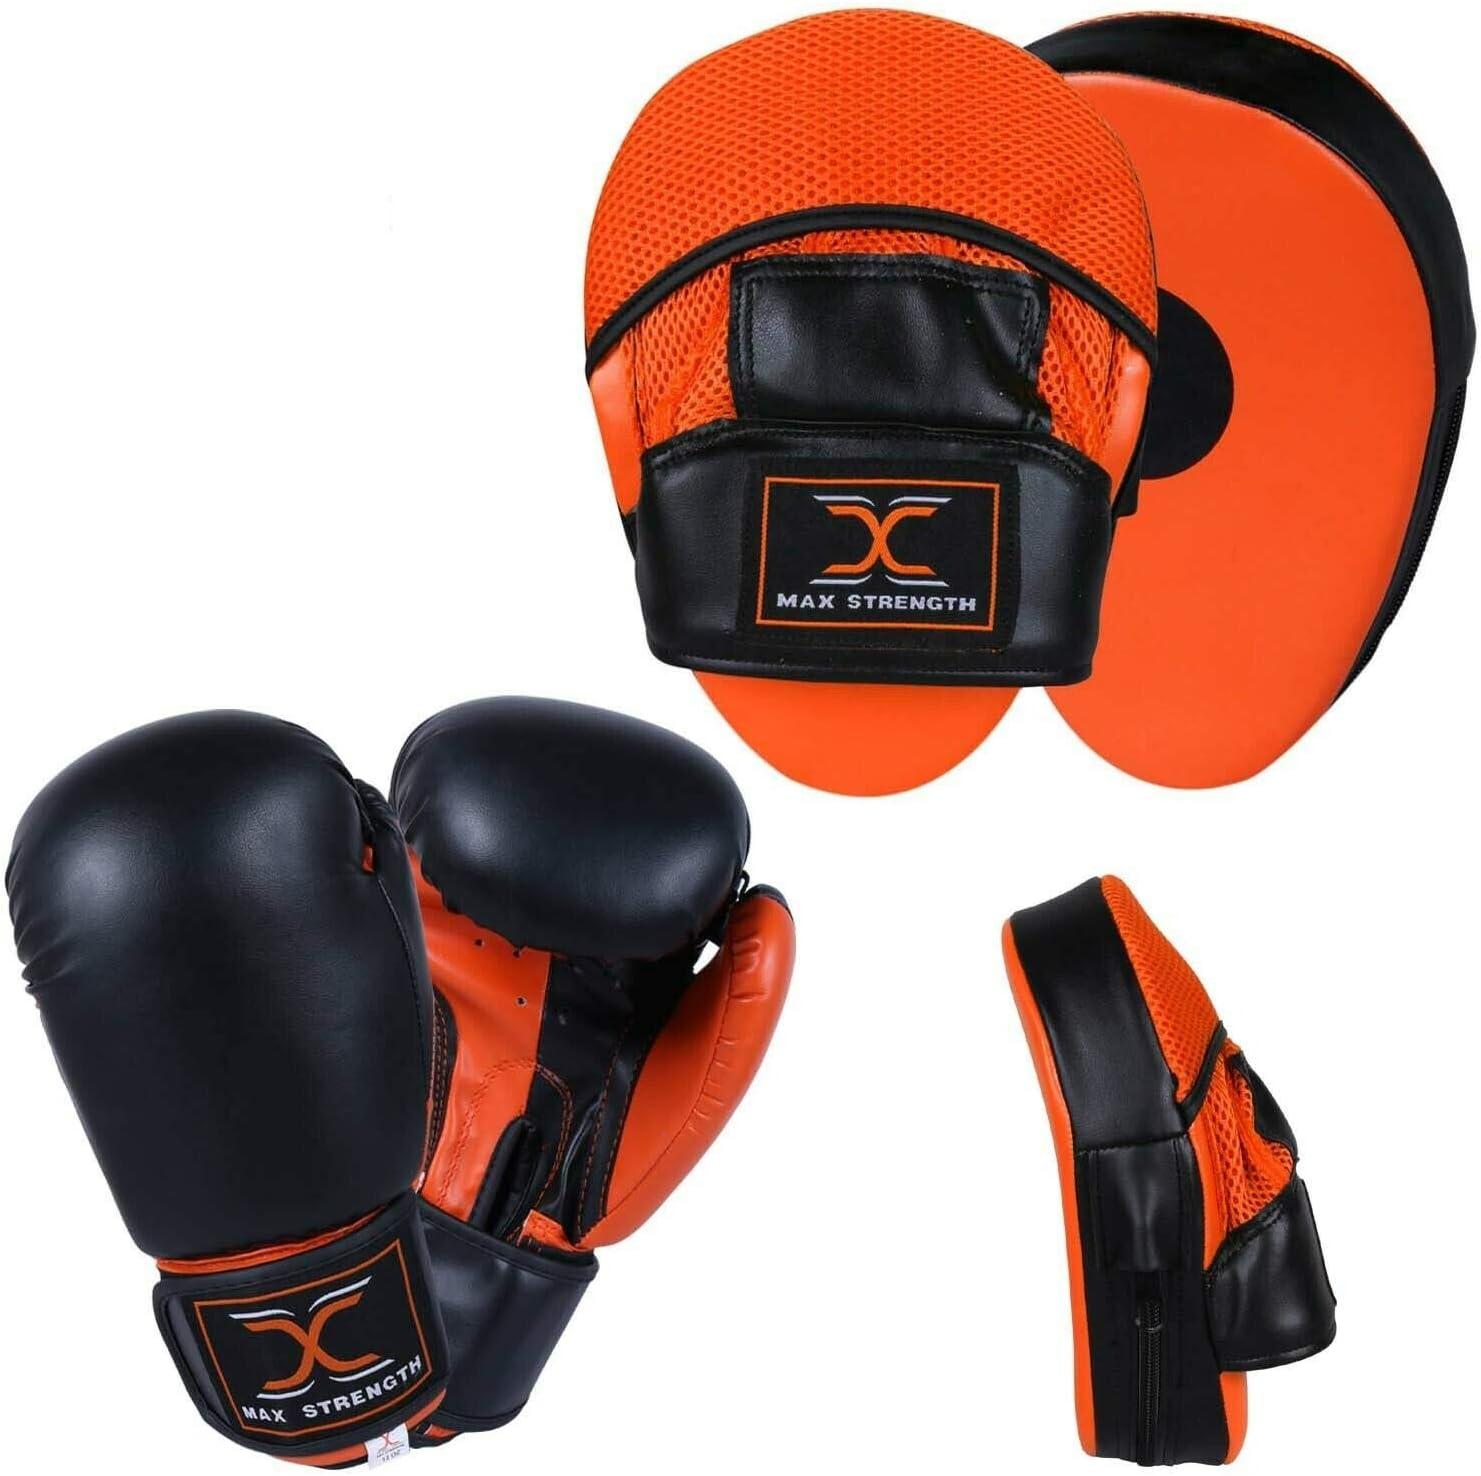 Kick Curved Pads Mitts,Hook and Jab Punching Kick Boxing Muay Thai MMA UK Pad